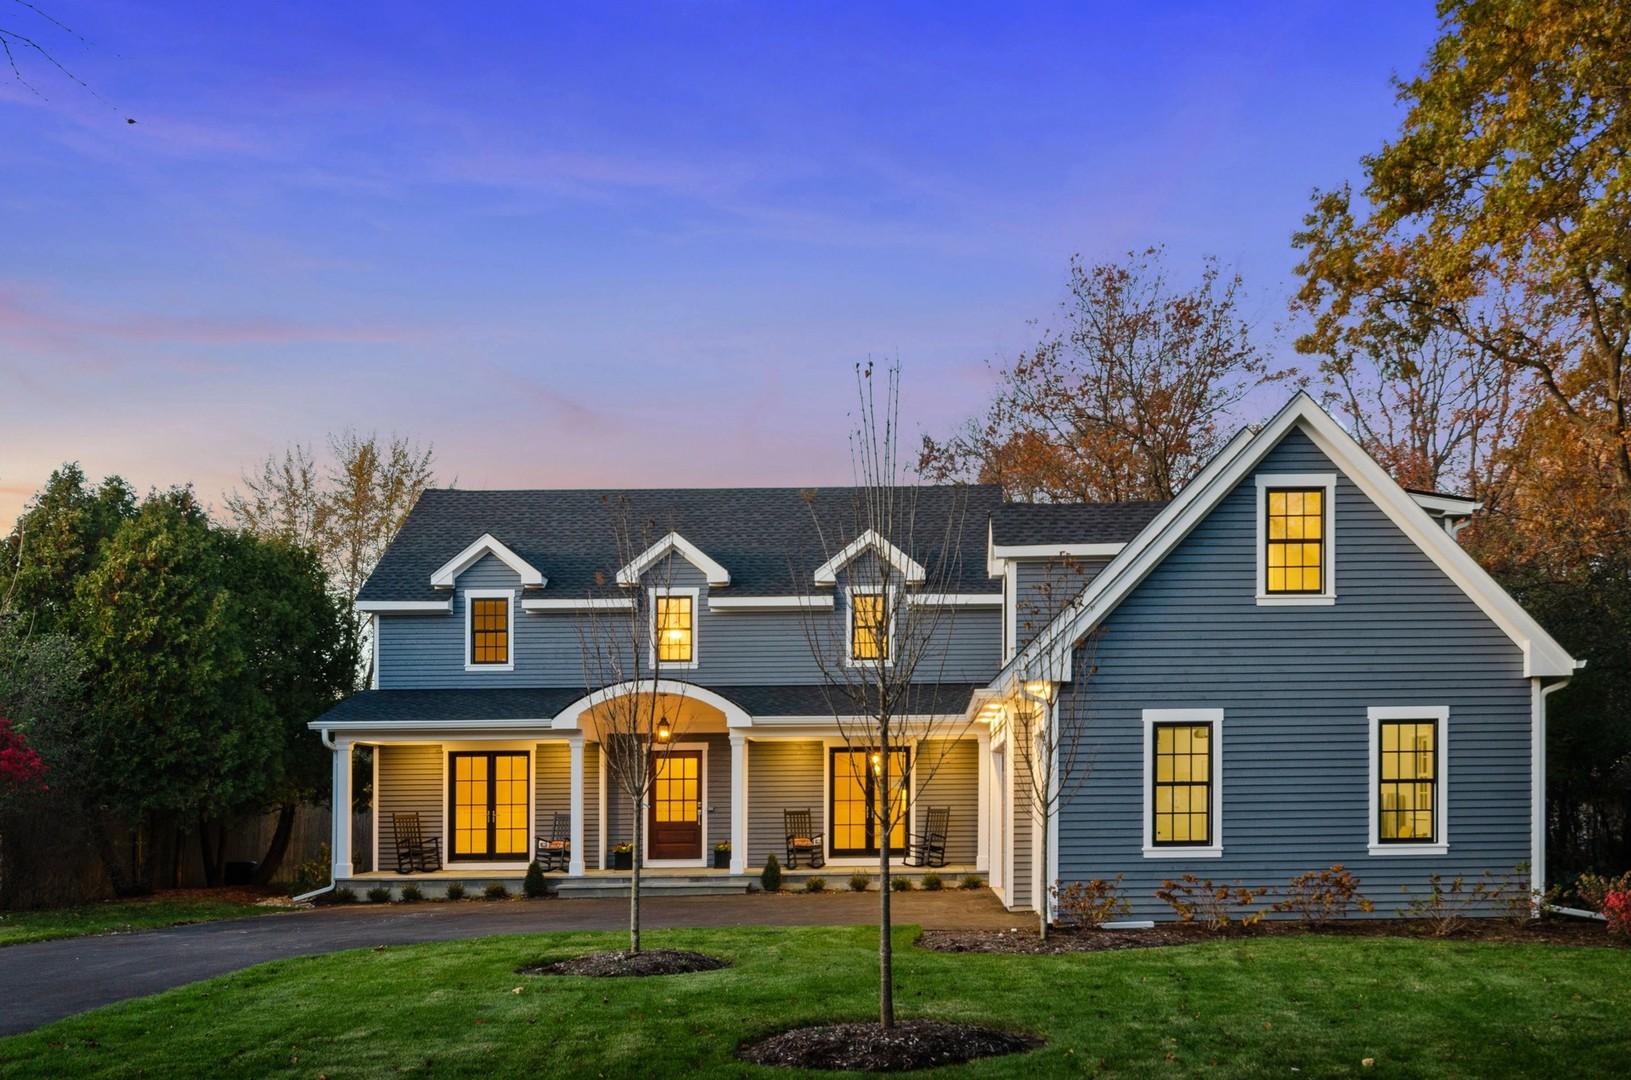 792 Morningside, Lake Forest, Illinois, 60045